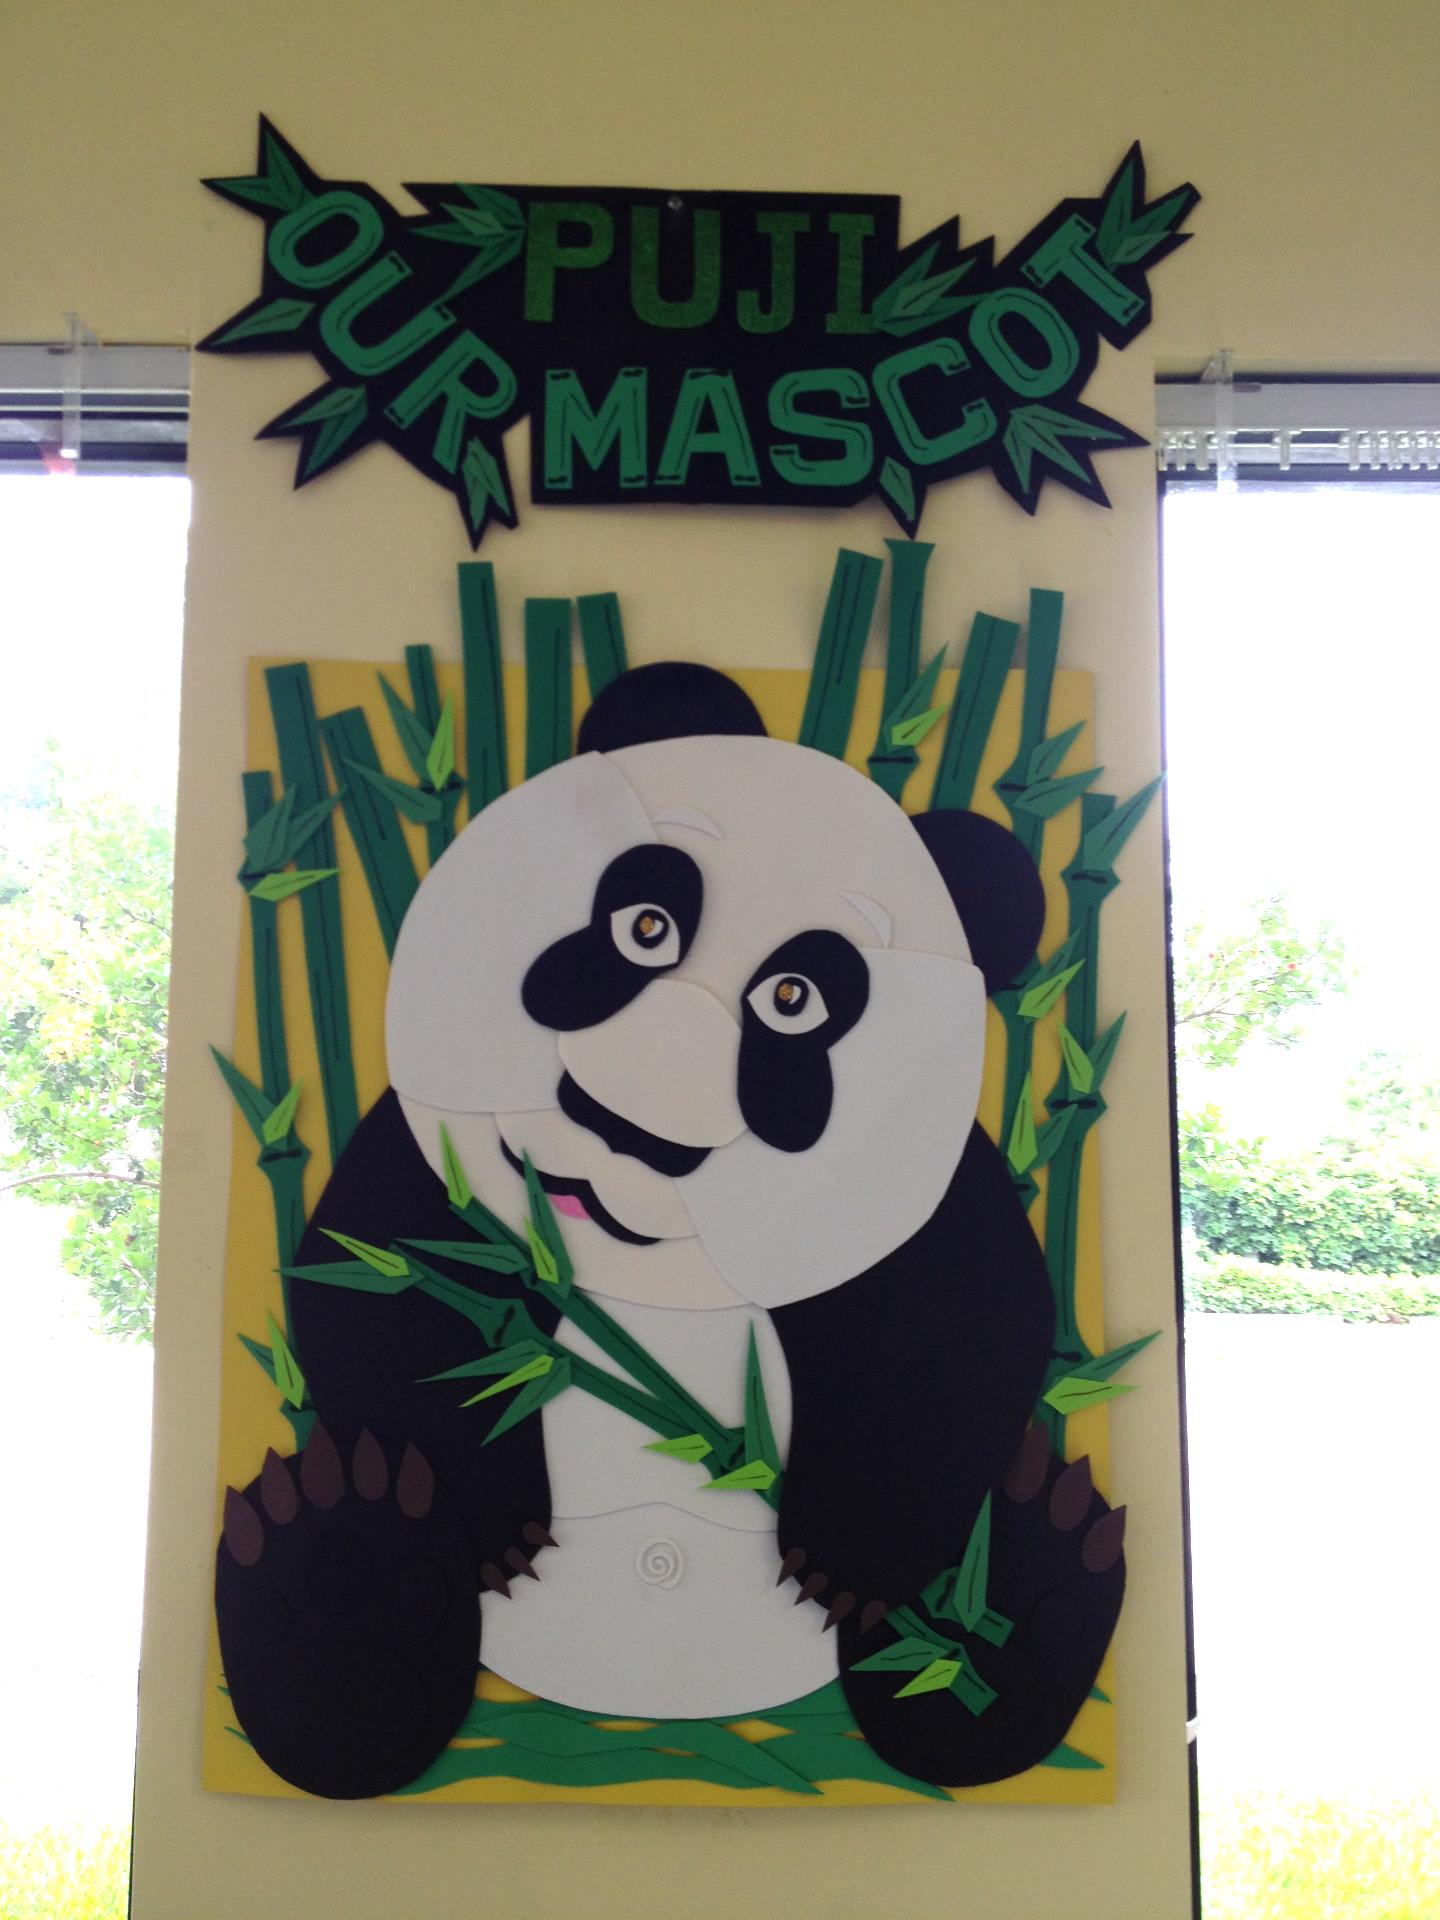 Puji the Panda